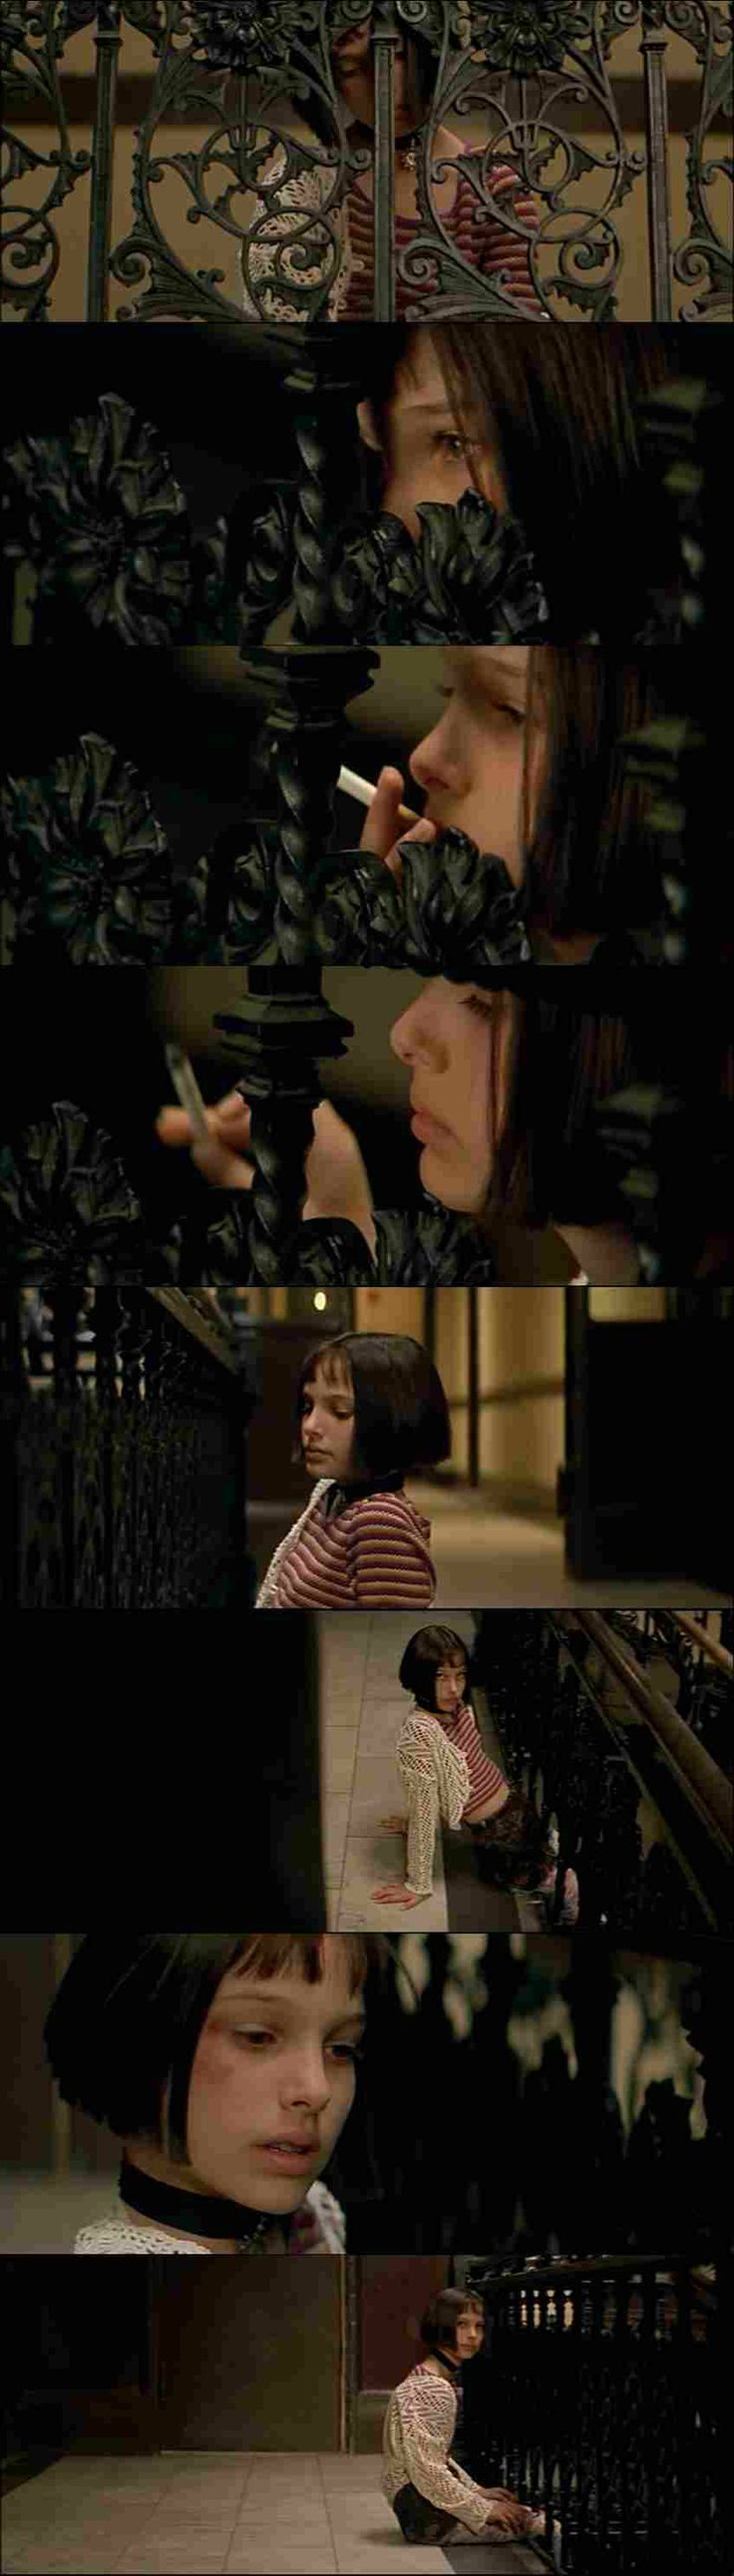 "Natalie Portman as Mathilda in ""Léon: The Professional"" (1994)"